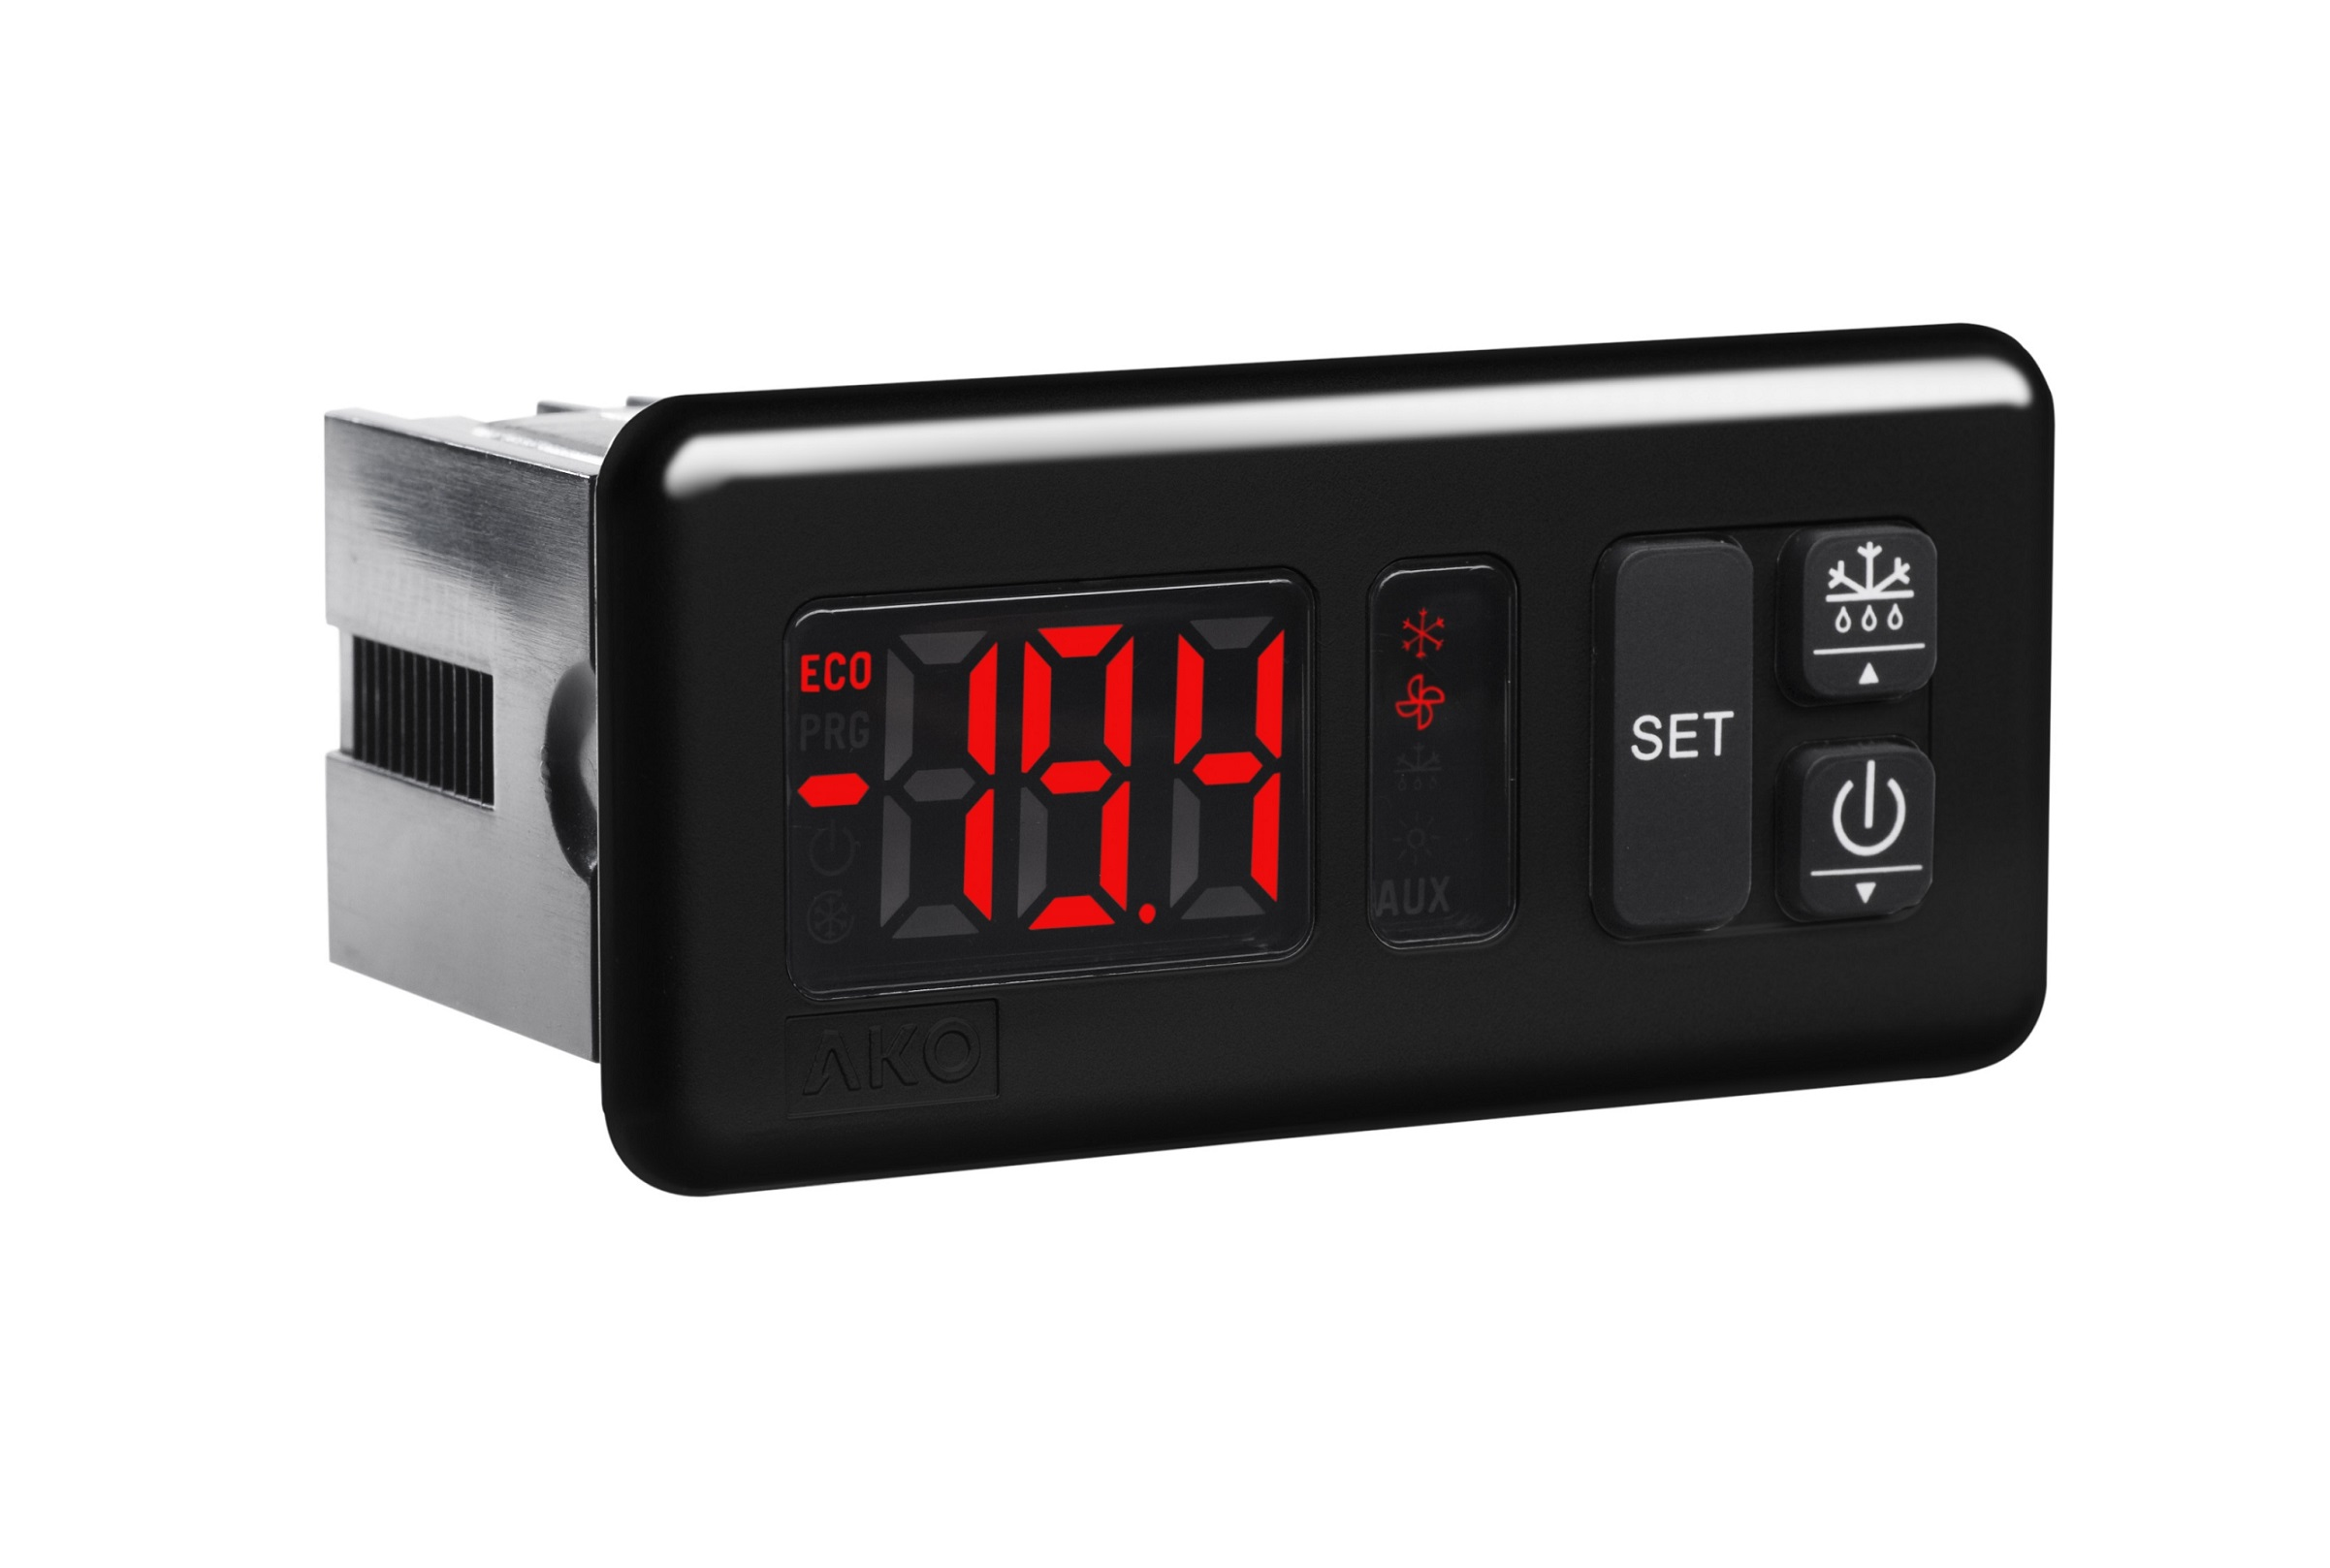 AKOCONTROL-termostato-panelable-1-rele